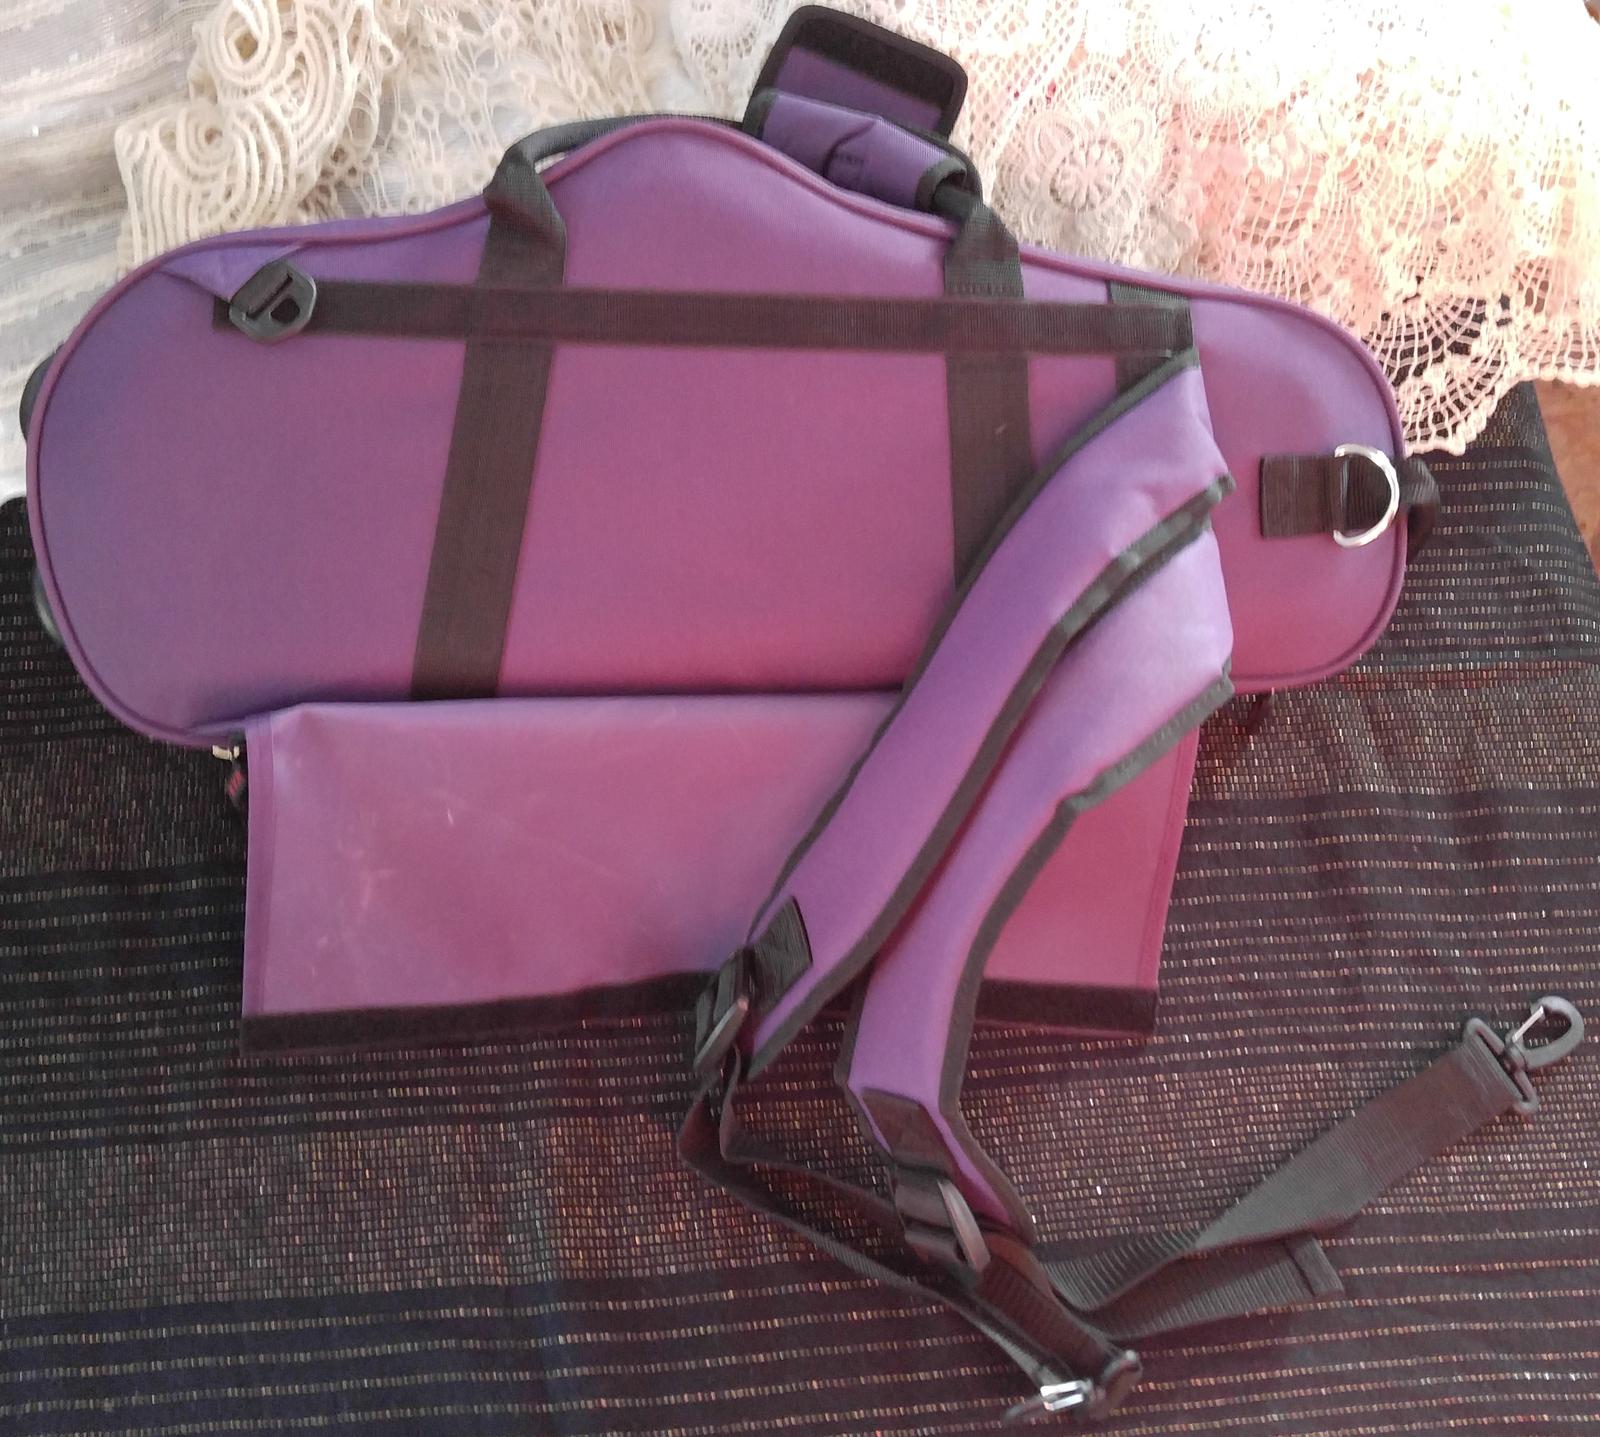 Protec Max Contoured Alto Saxophone Case - Purple